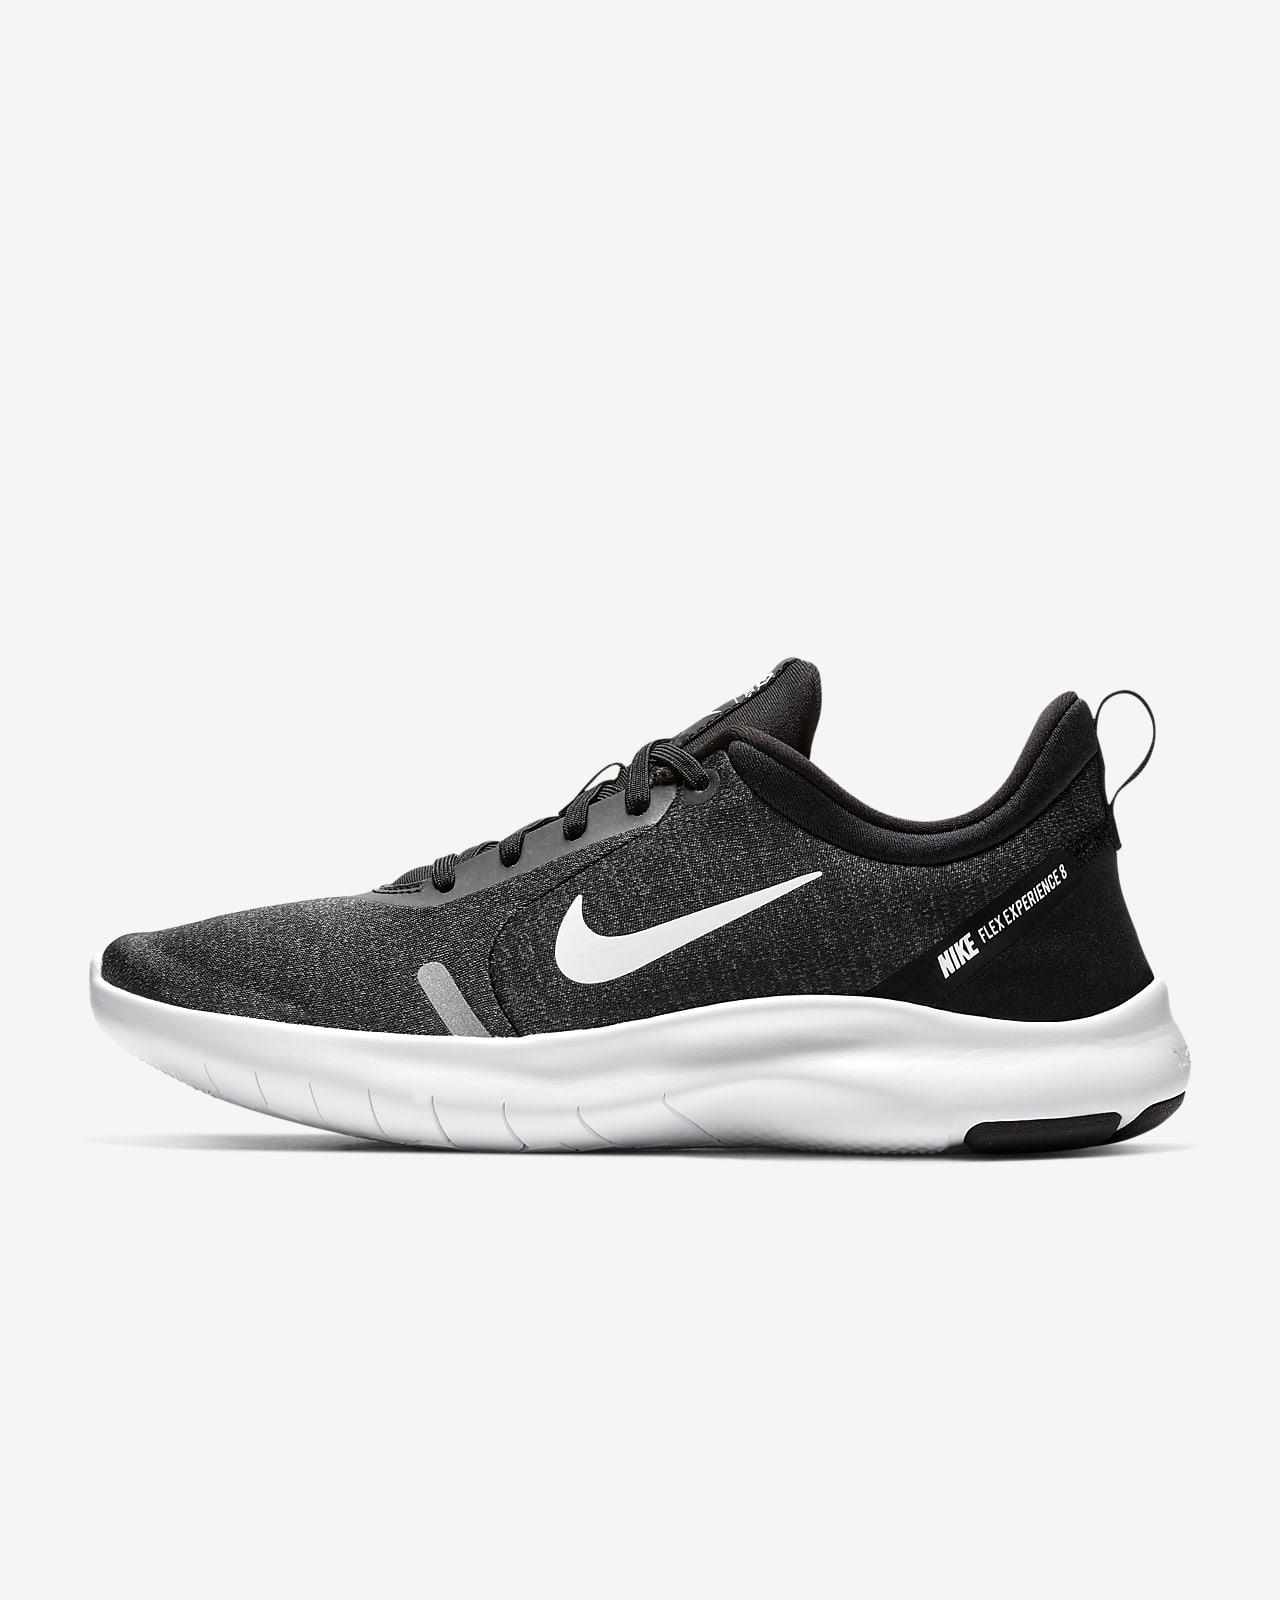 Calzado de running para mujer Nike Flex Experience RN 8